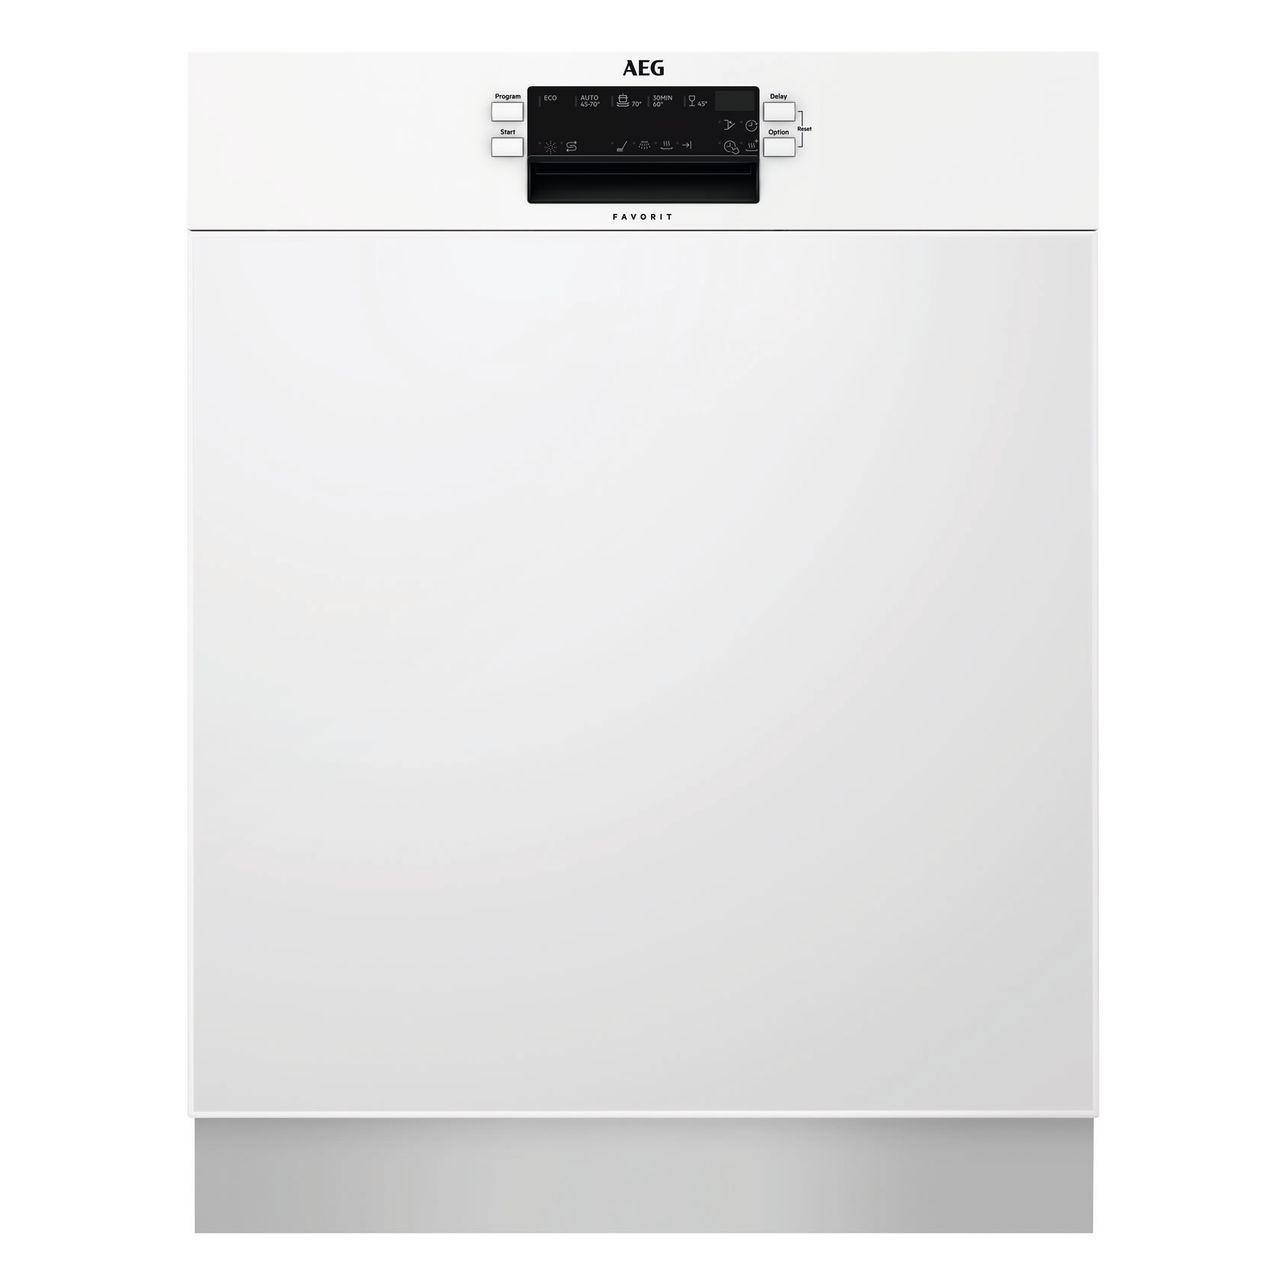 Aeg Unterbau Kühlschrank Dekorfähig : Geschirrspüler cm unterbau dekorfähig: unterbau spülmaschine mit cm